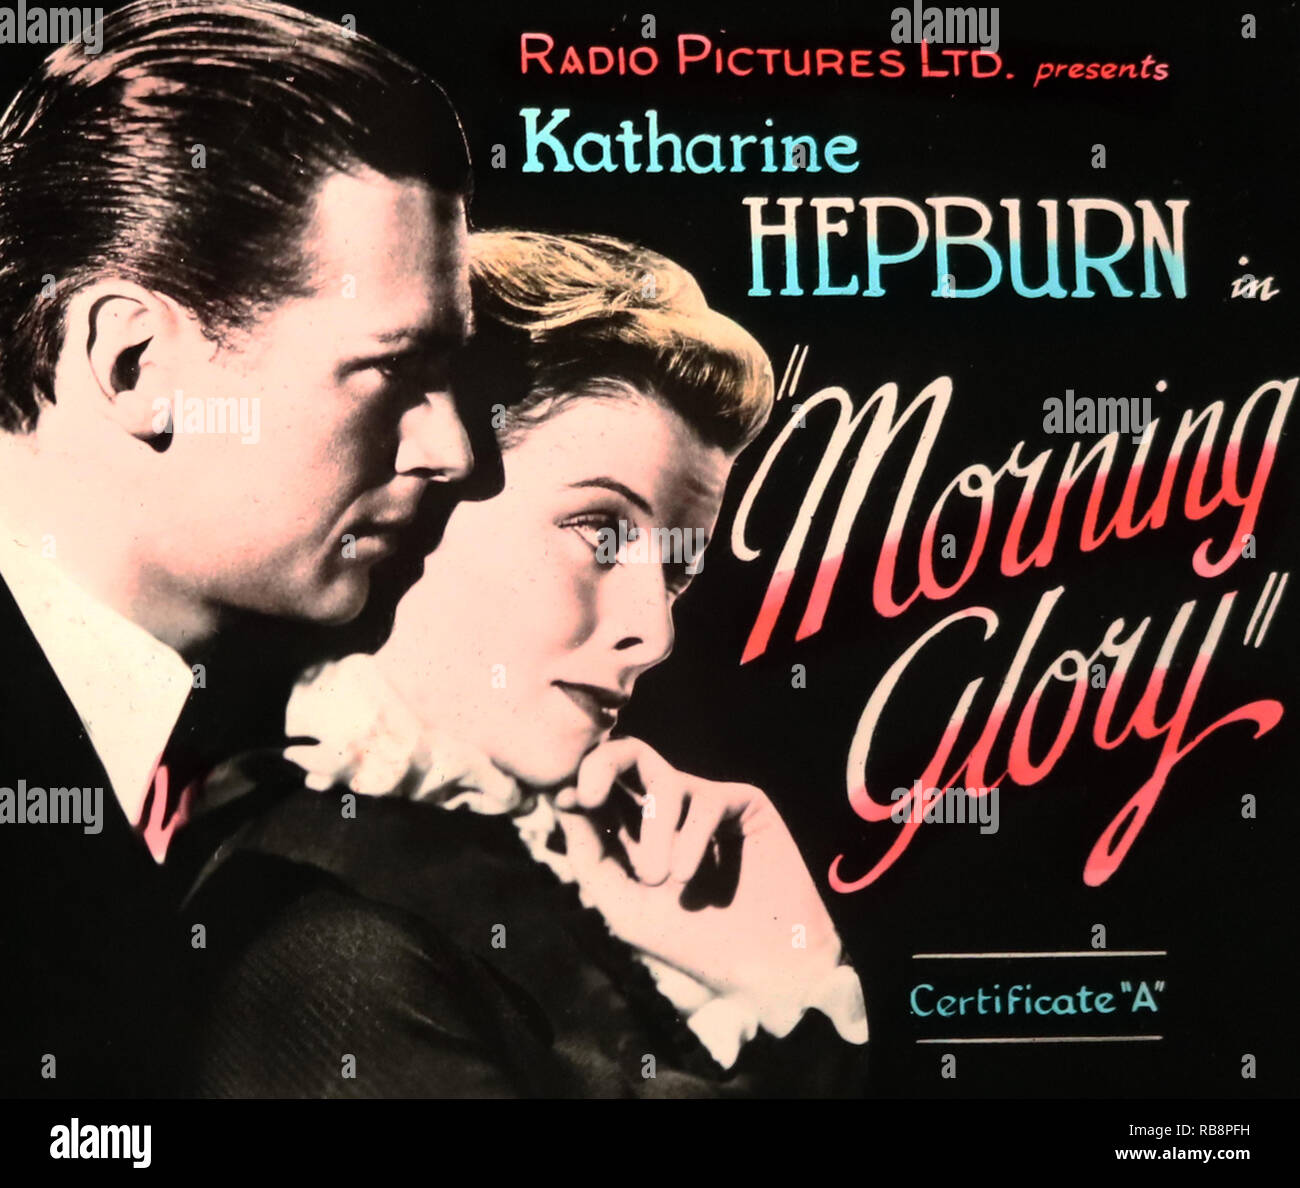 Katherine Hepburn 'Morning Glory' movie advertisement - Stock Image